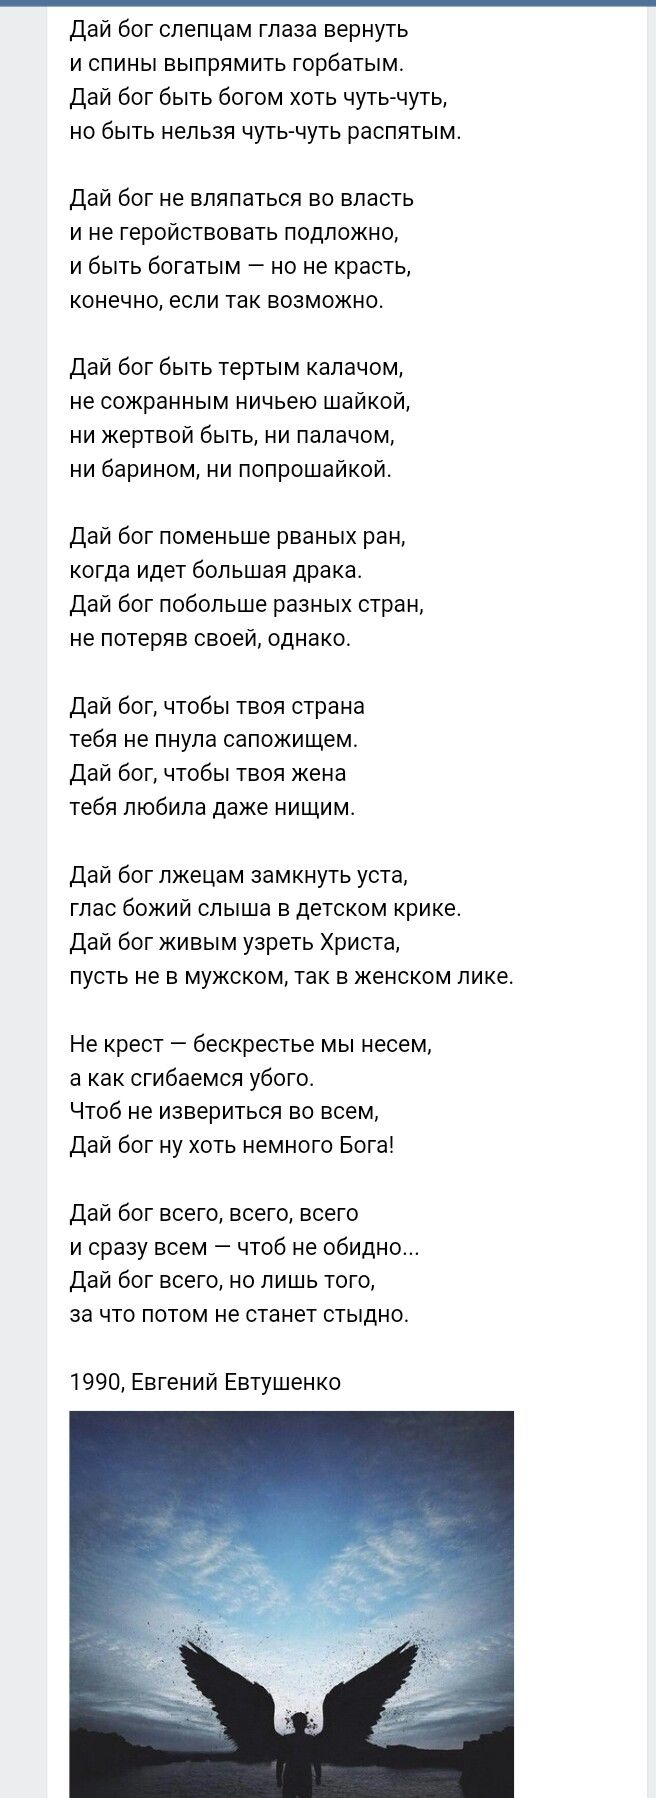 Евтушенко